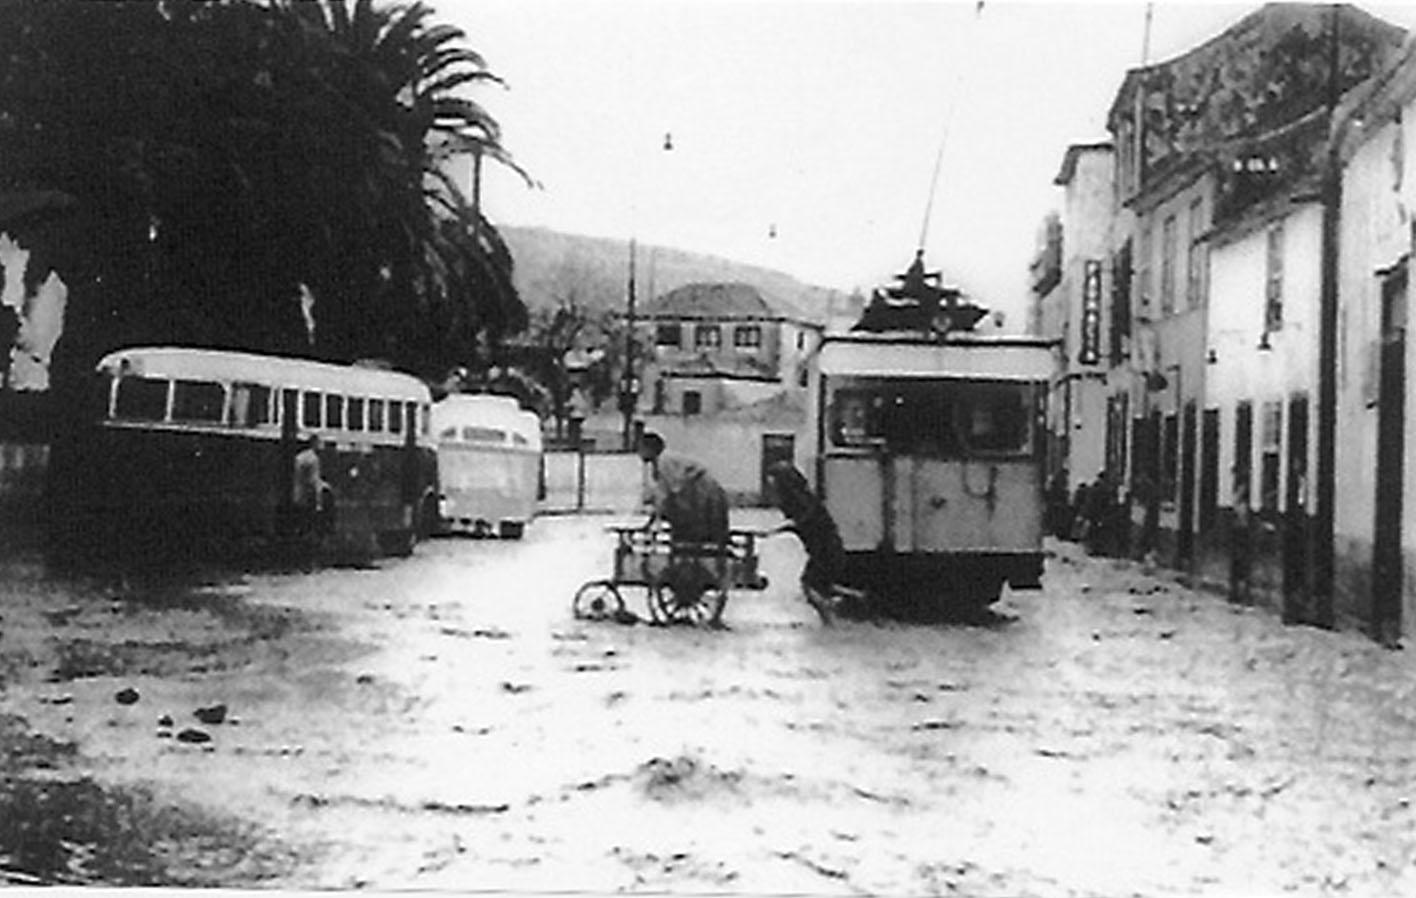 Primera entrega de fotos fotografias antiguas de tenerife - Fotos antiguas de macael ...